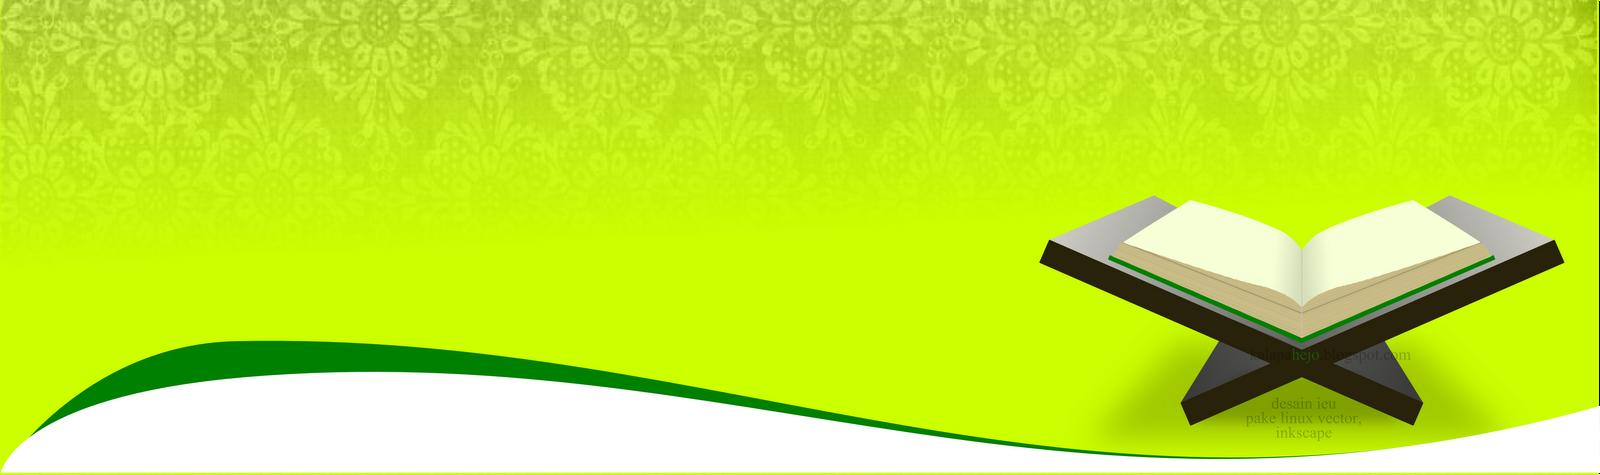 Kumpulan Desain Spanduk Terkeren - Background | Admin Madrasah